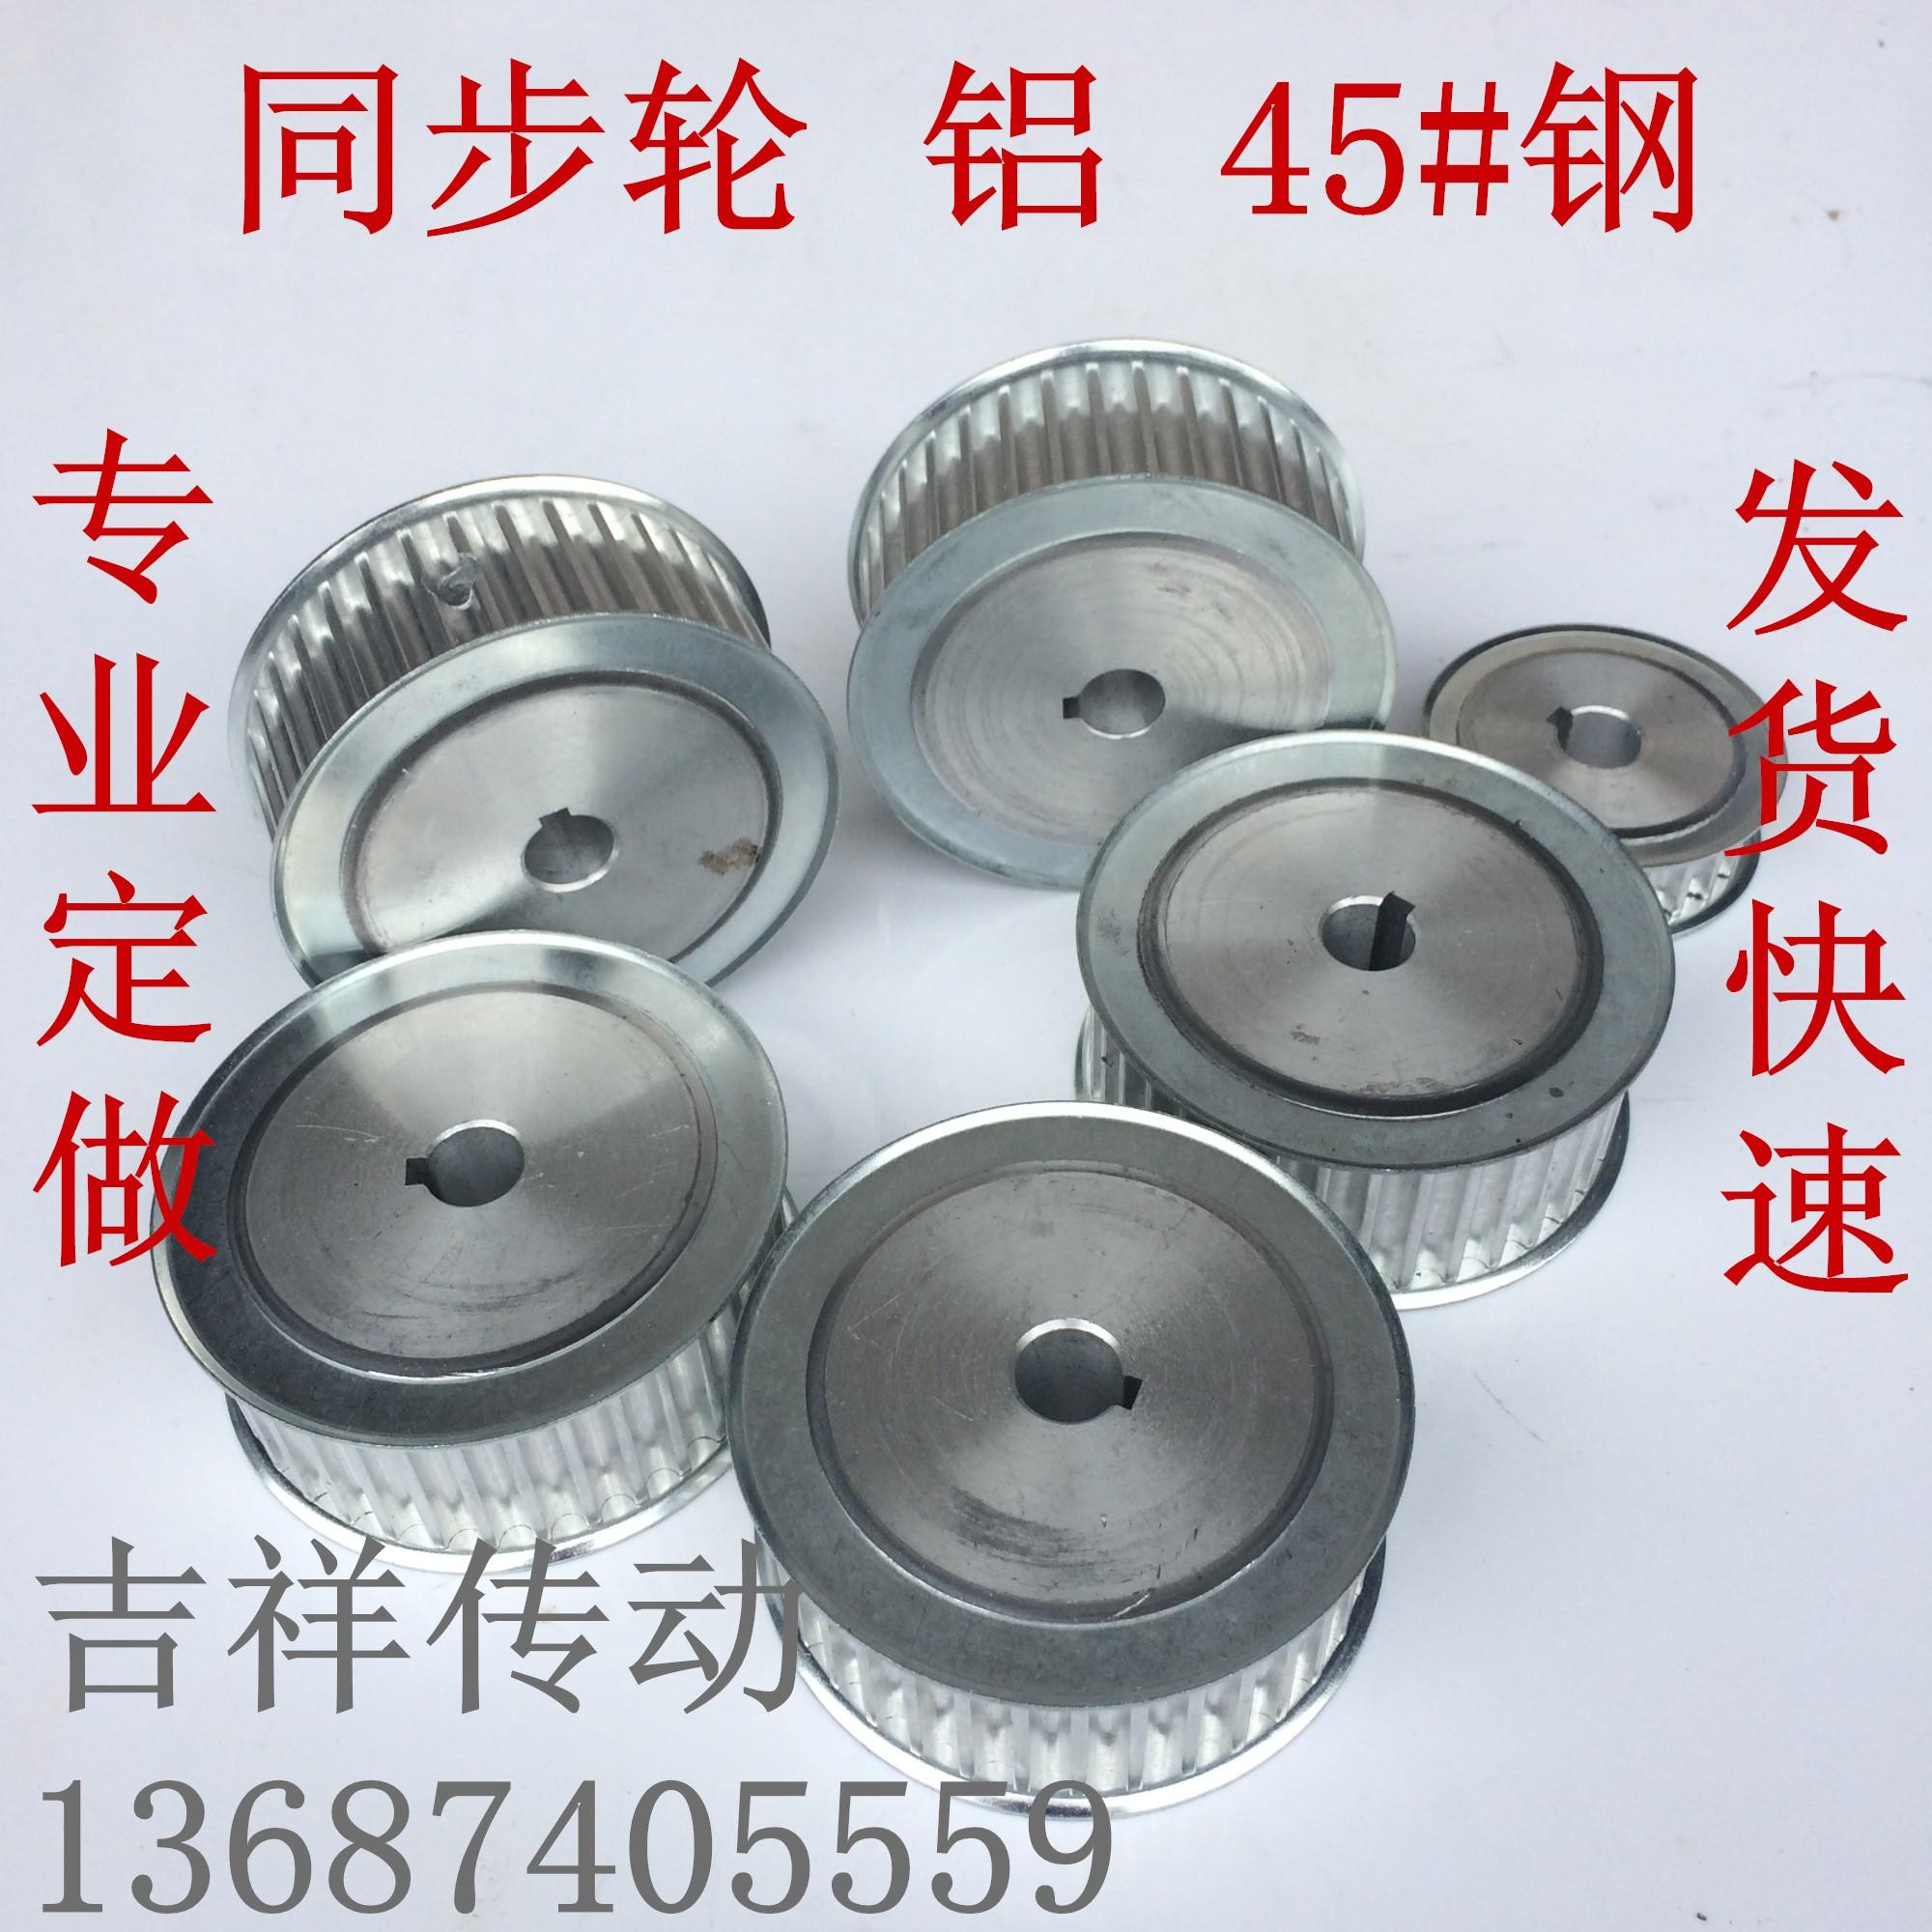 Синхронные шкивы синхронных колес Синхронные шкивы MXL XL L H XH 3M 5M 8M 14M T5 T10 AT10